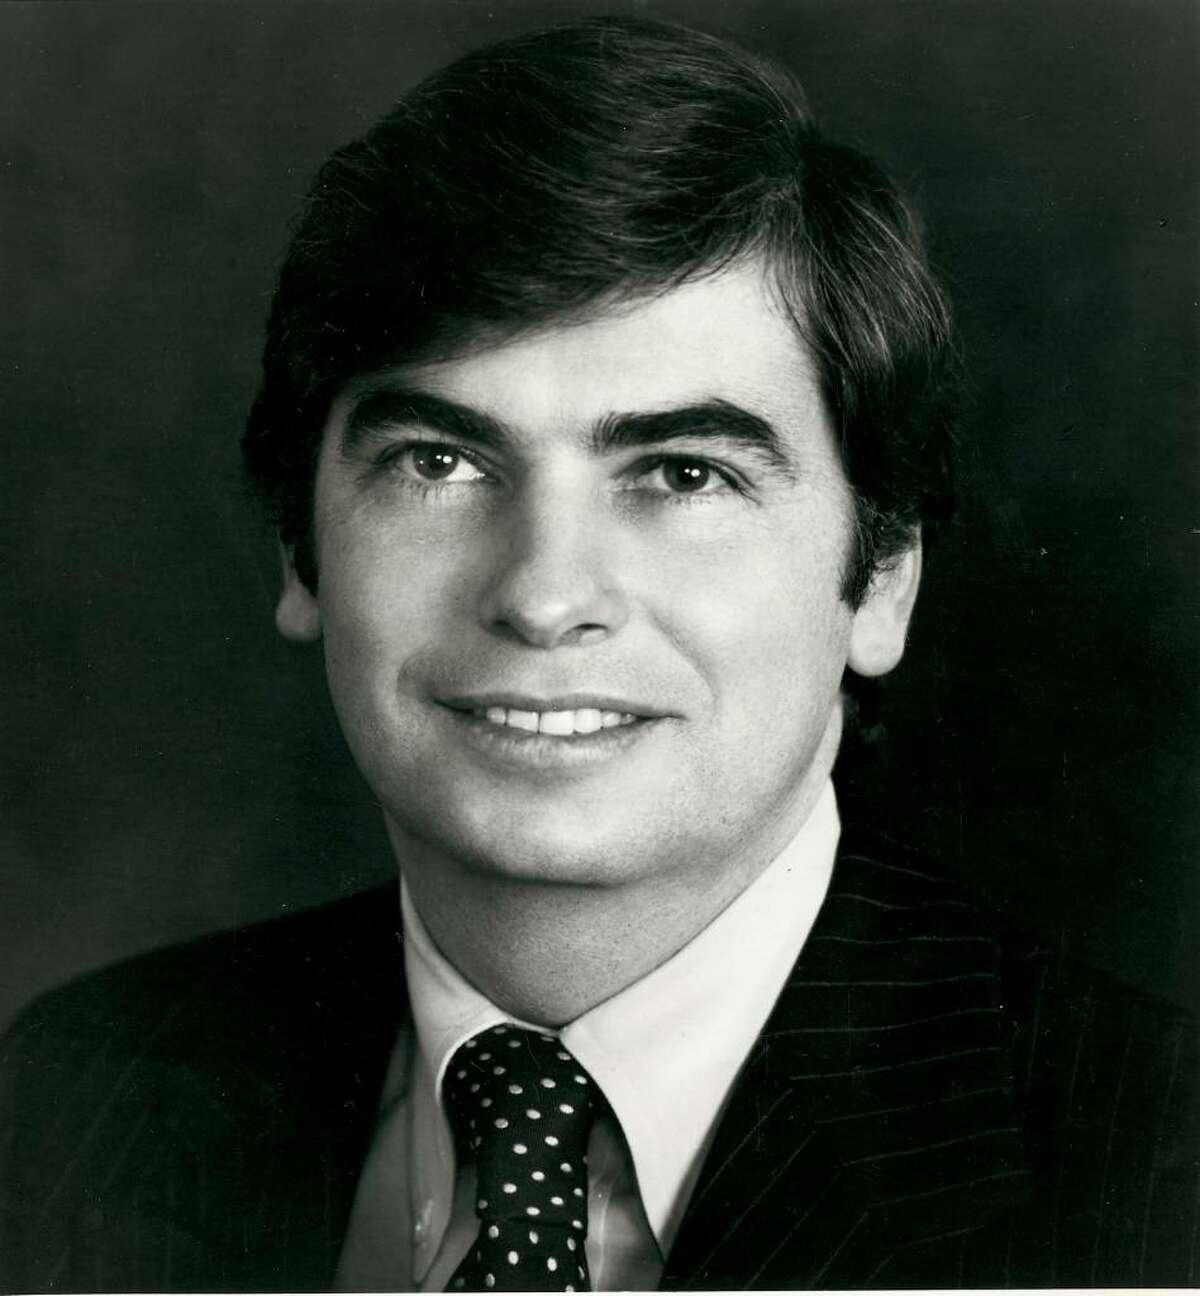 Christopher J. Dodd in October of 1976.